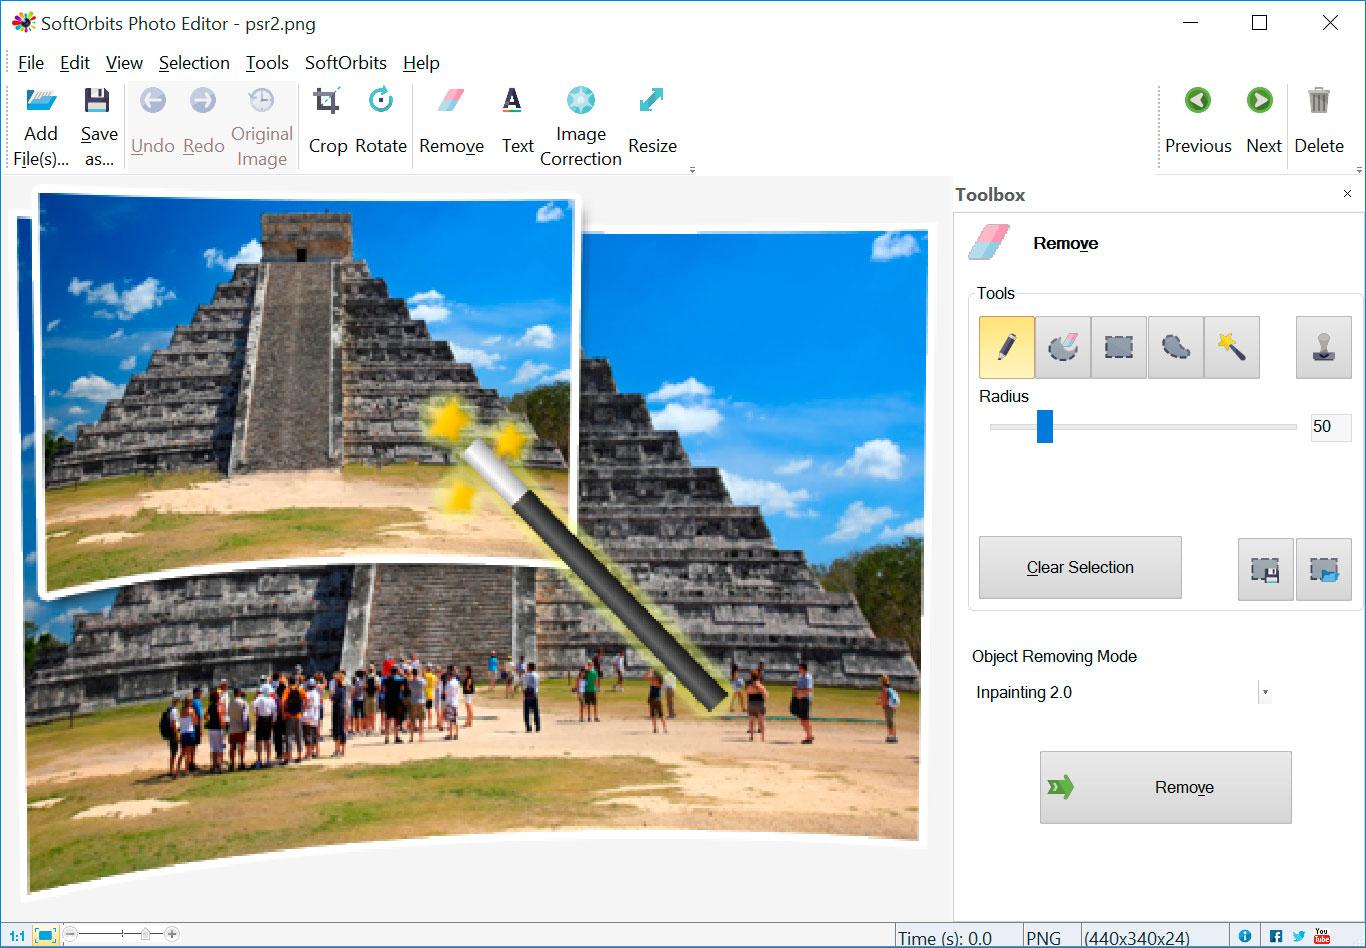 SoftOrbits Photo Editor Screenshots